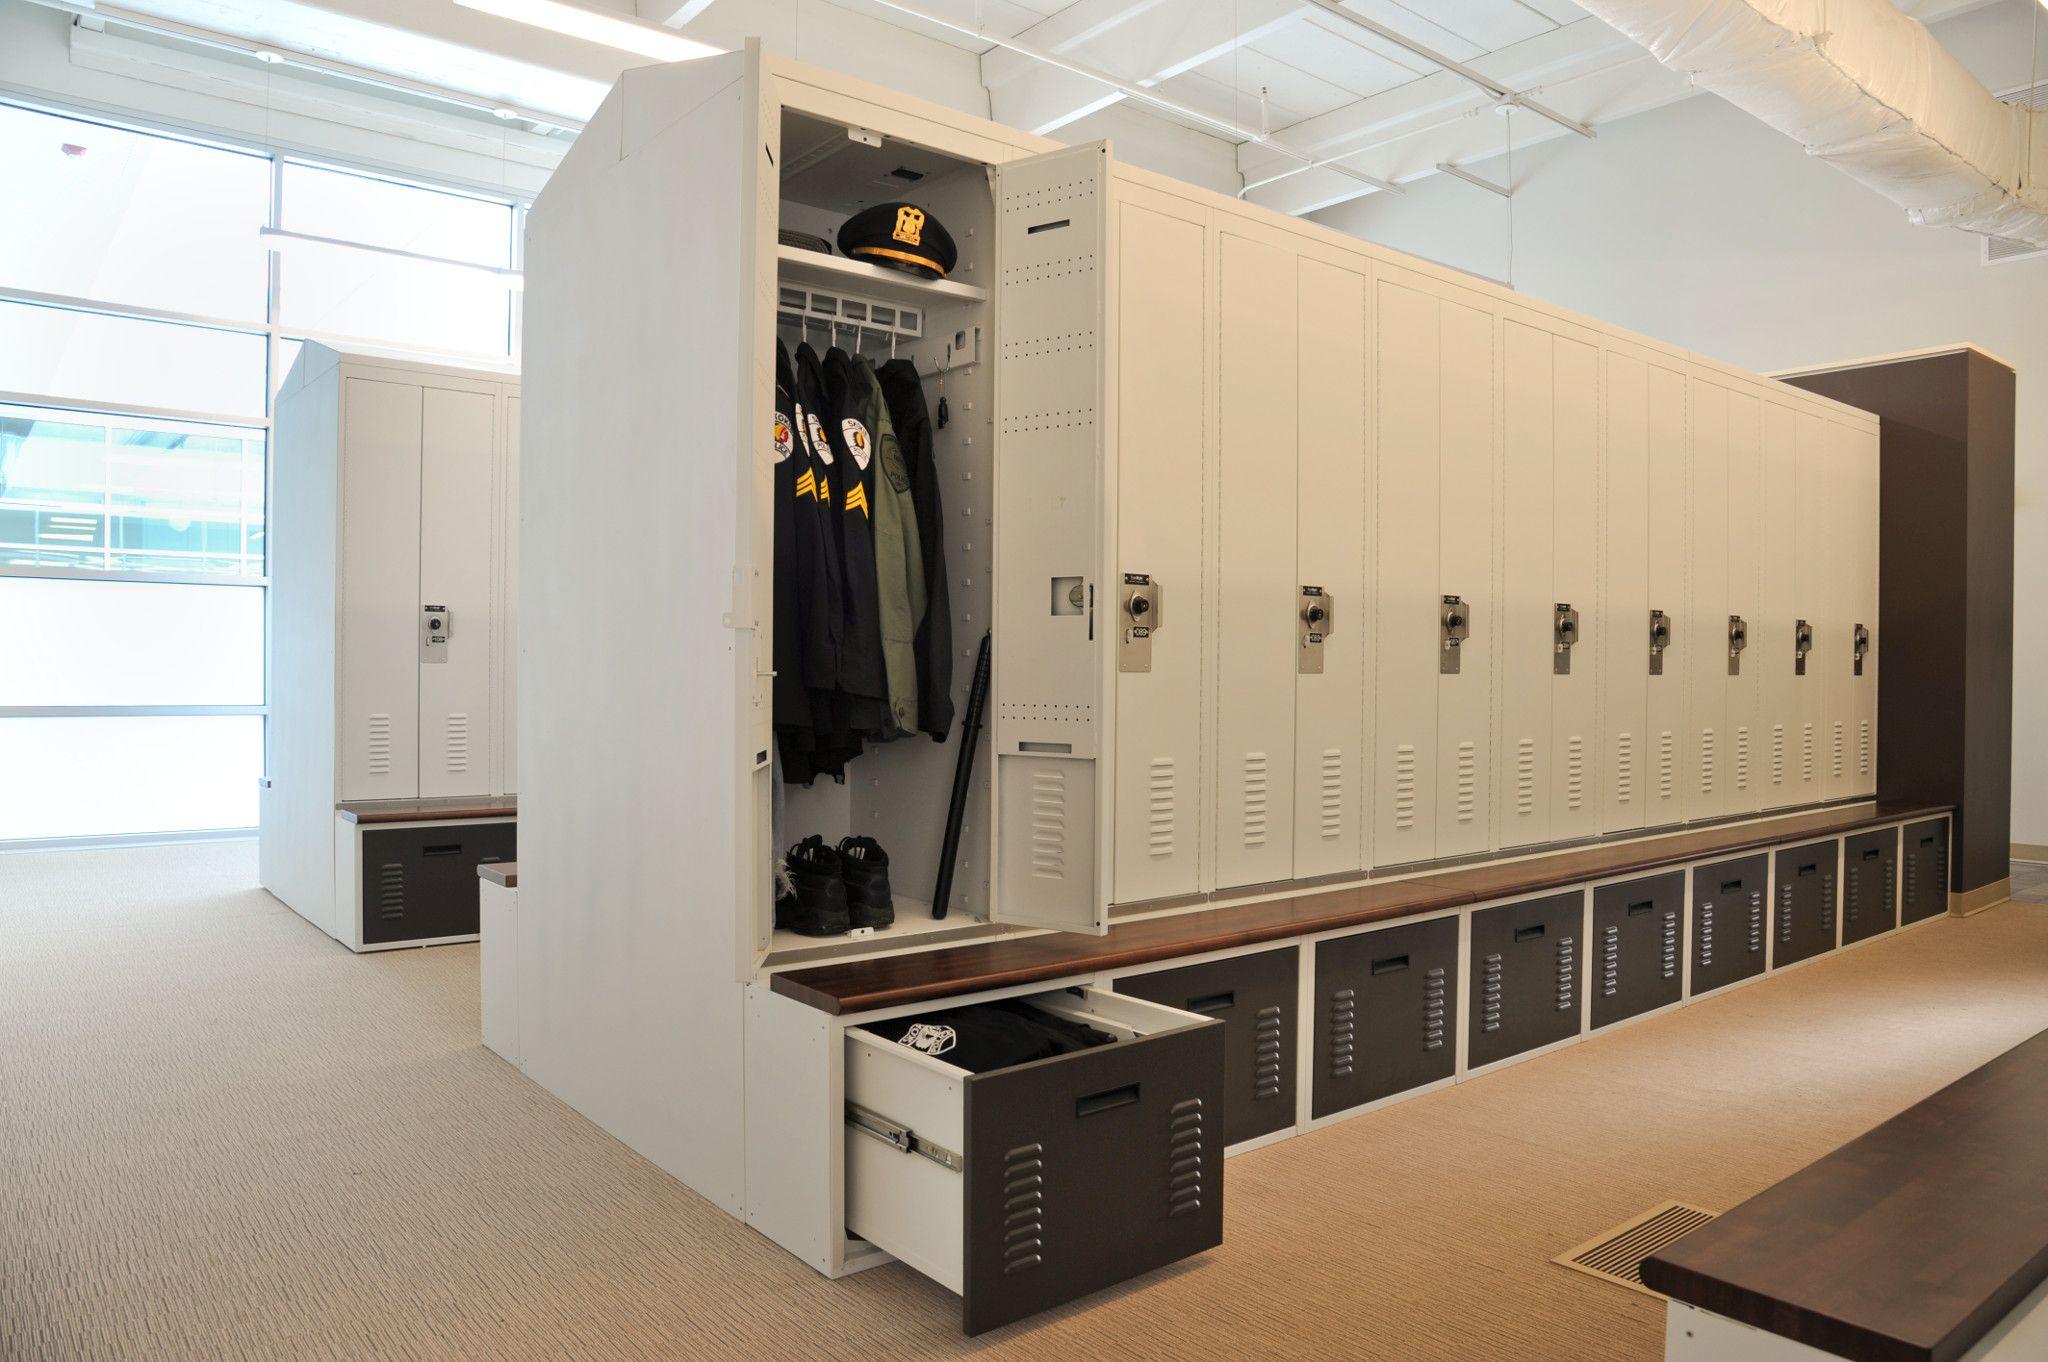 Personal gear locker storage at police department